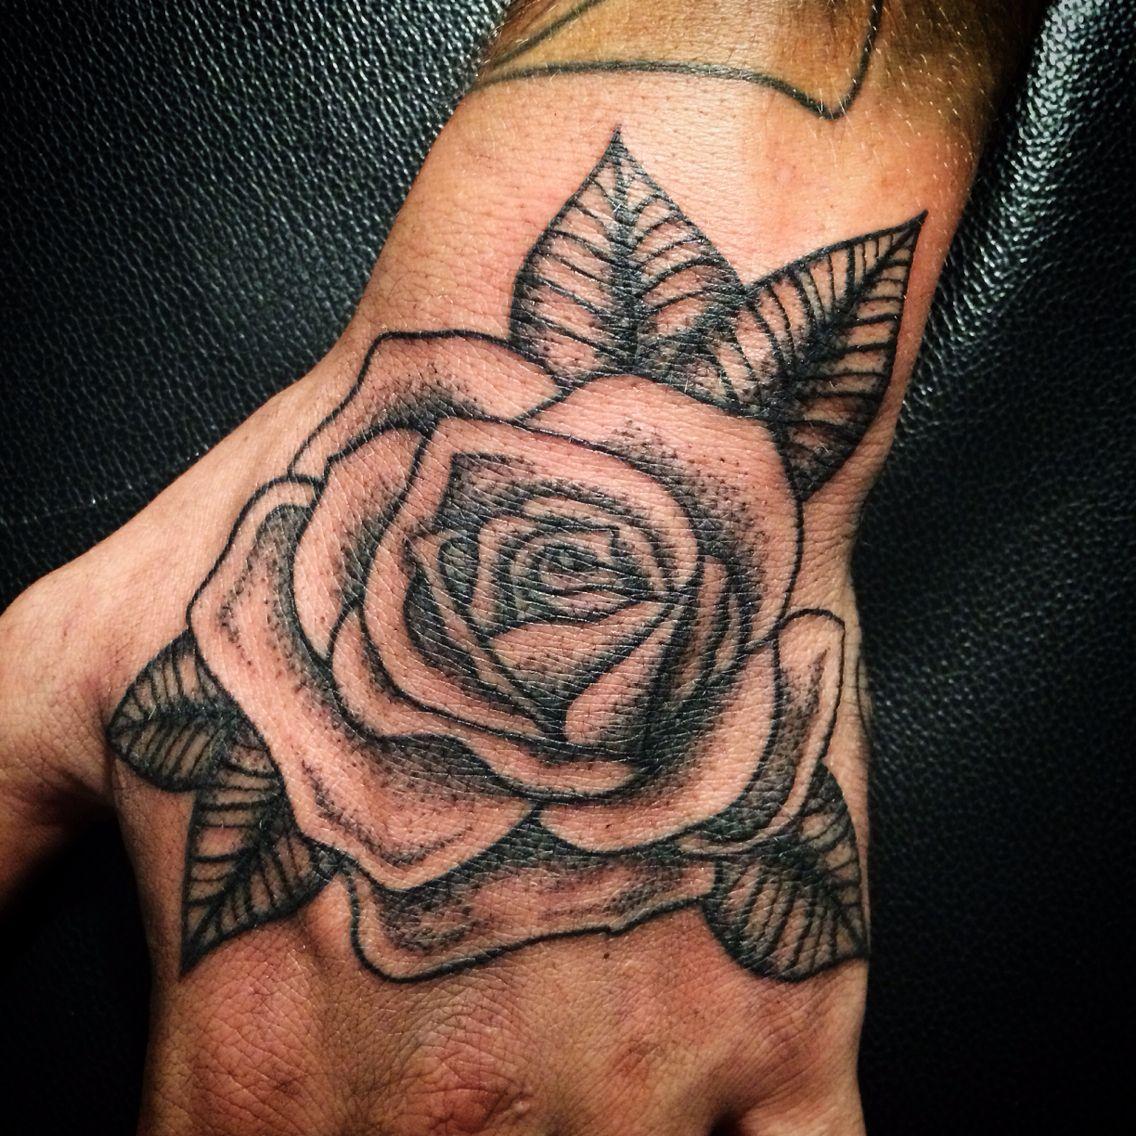 Rose Hand Hand tattoos for guys, Rose hand tattoo